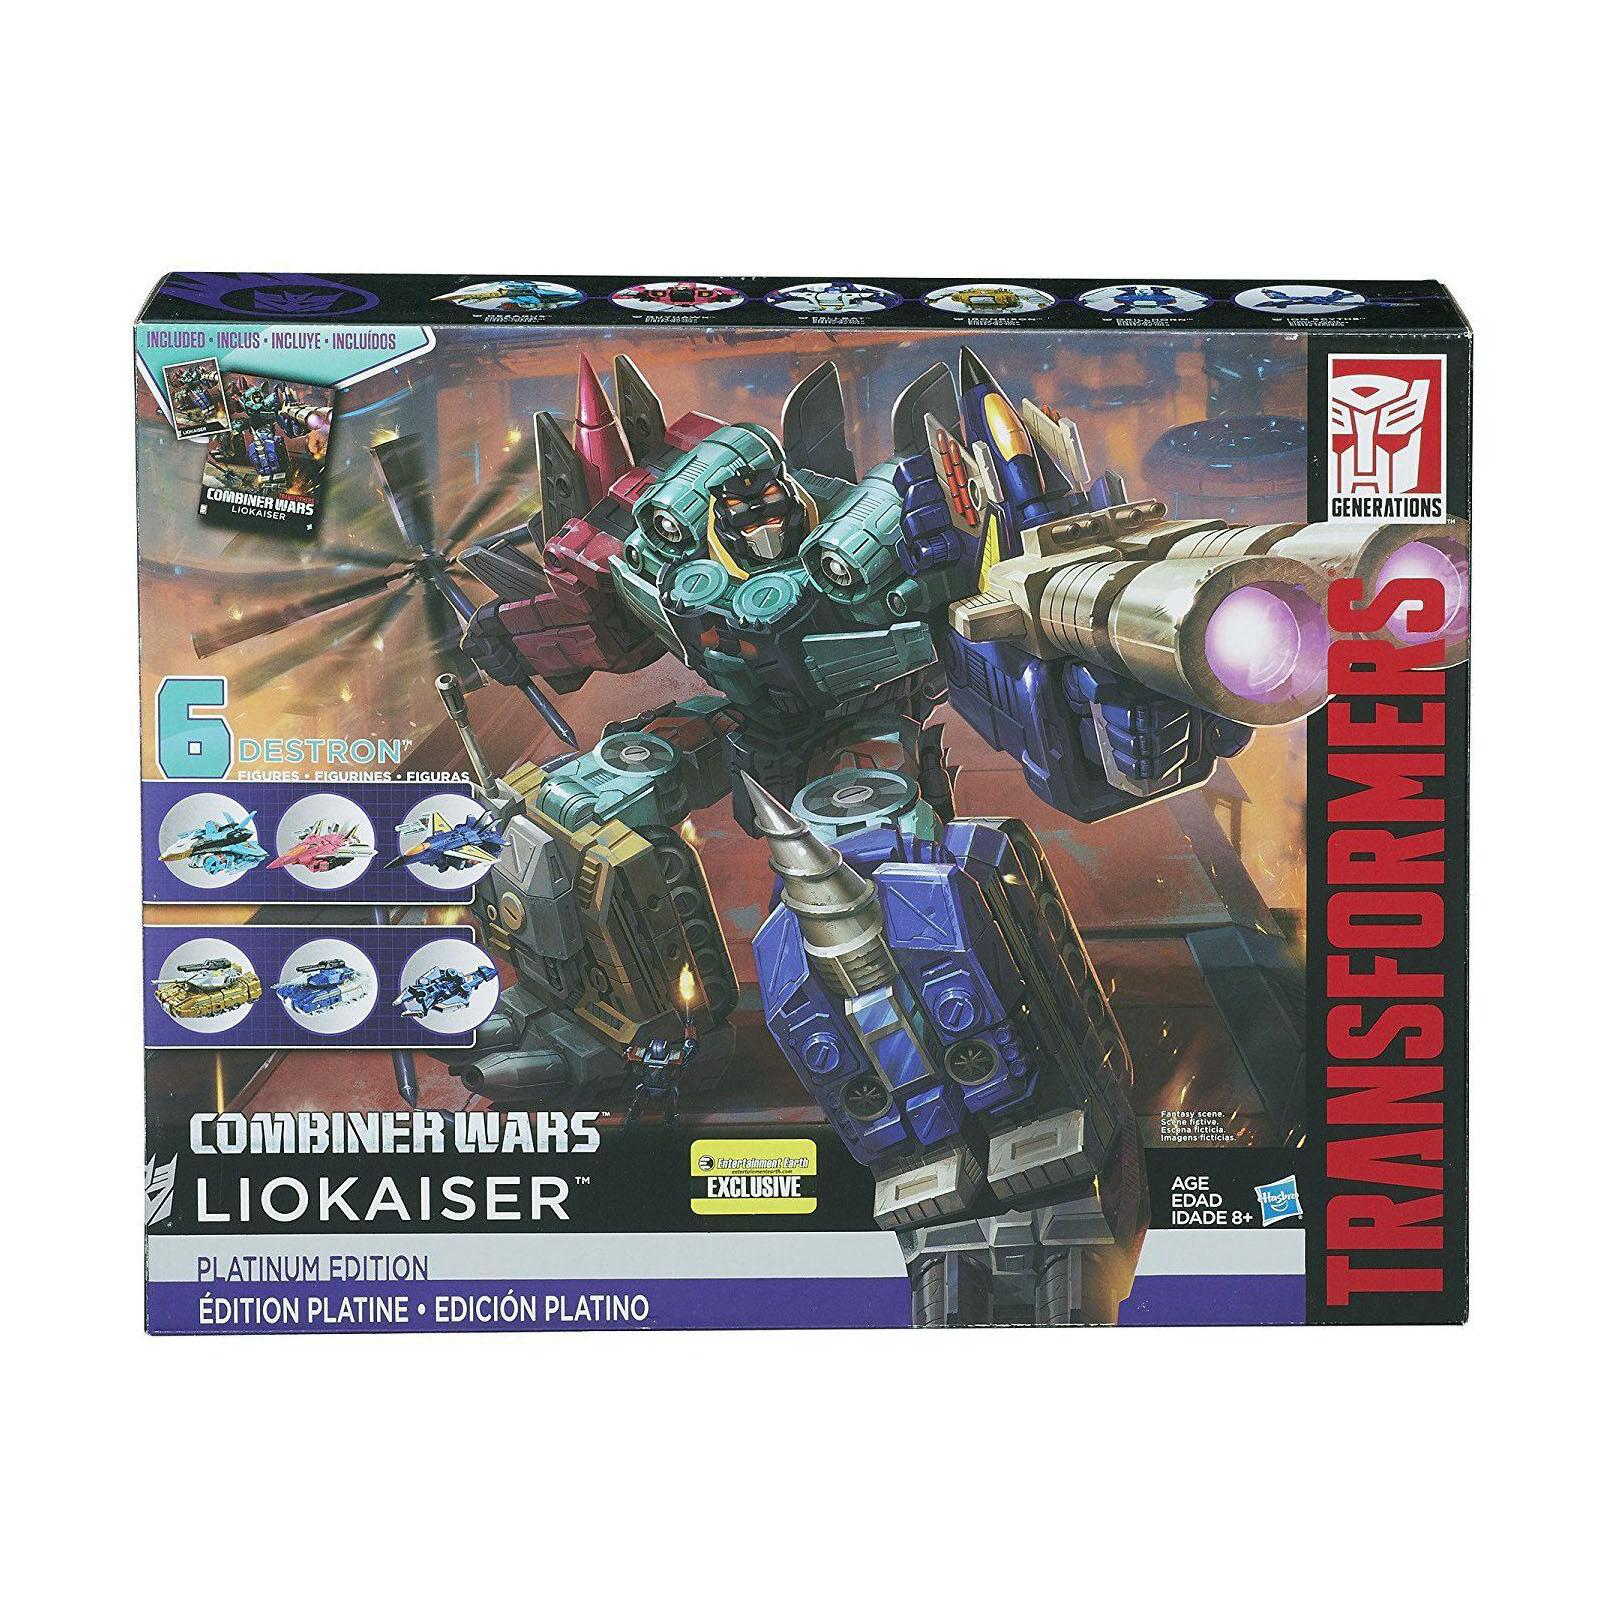 Transformers Generations Platinum Edition Combiner Wars LIOKAISER Spielzeug NEU